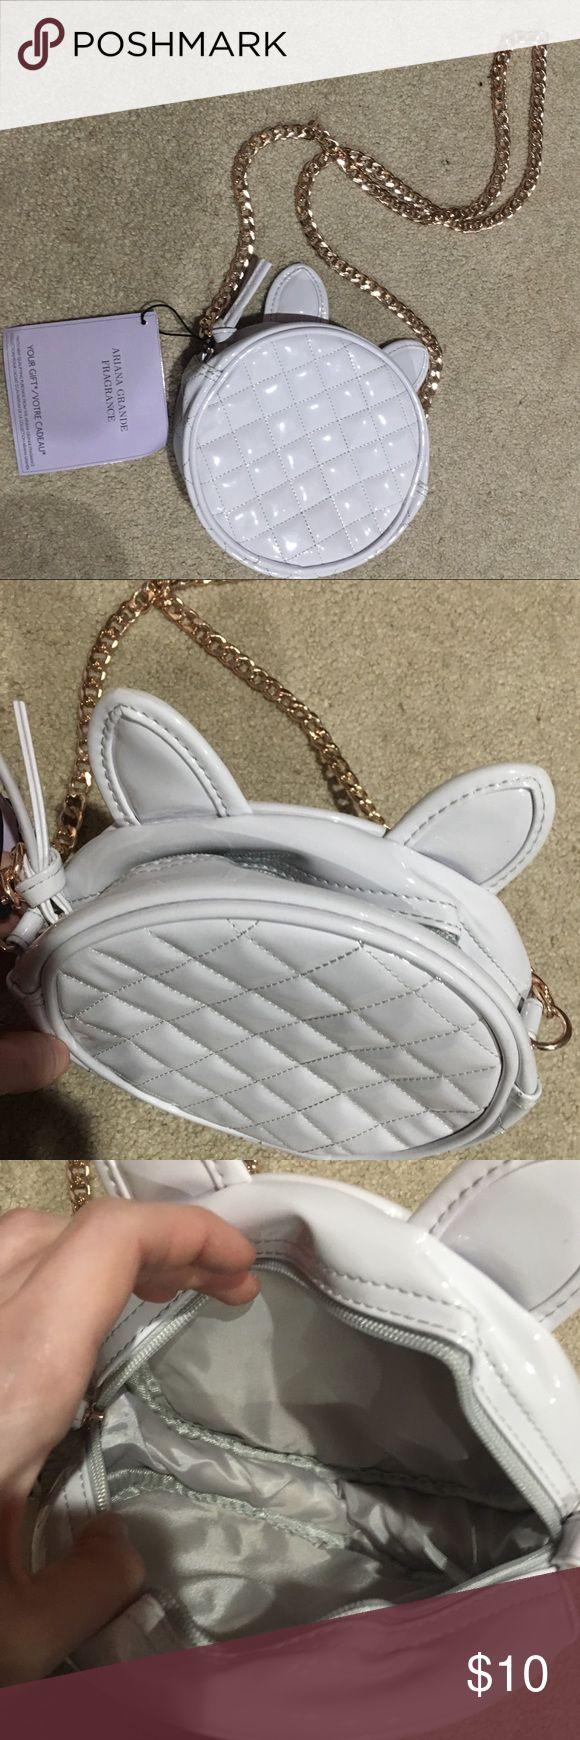 Ariana Grande Cat Purse Ariana Hrande white cat purse with rose gold chain strap  make an offer! Ariana Grande Bags Crossbody Bags